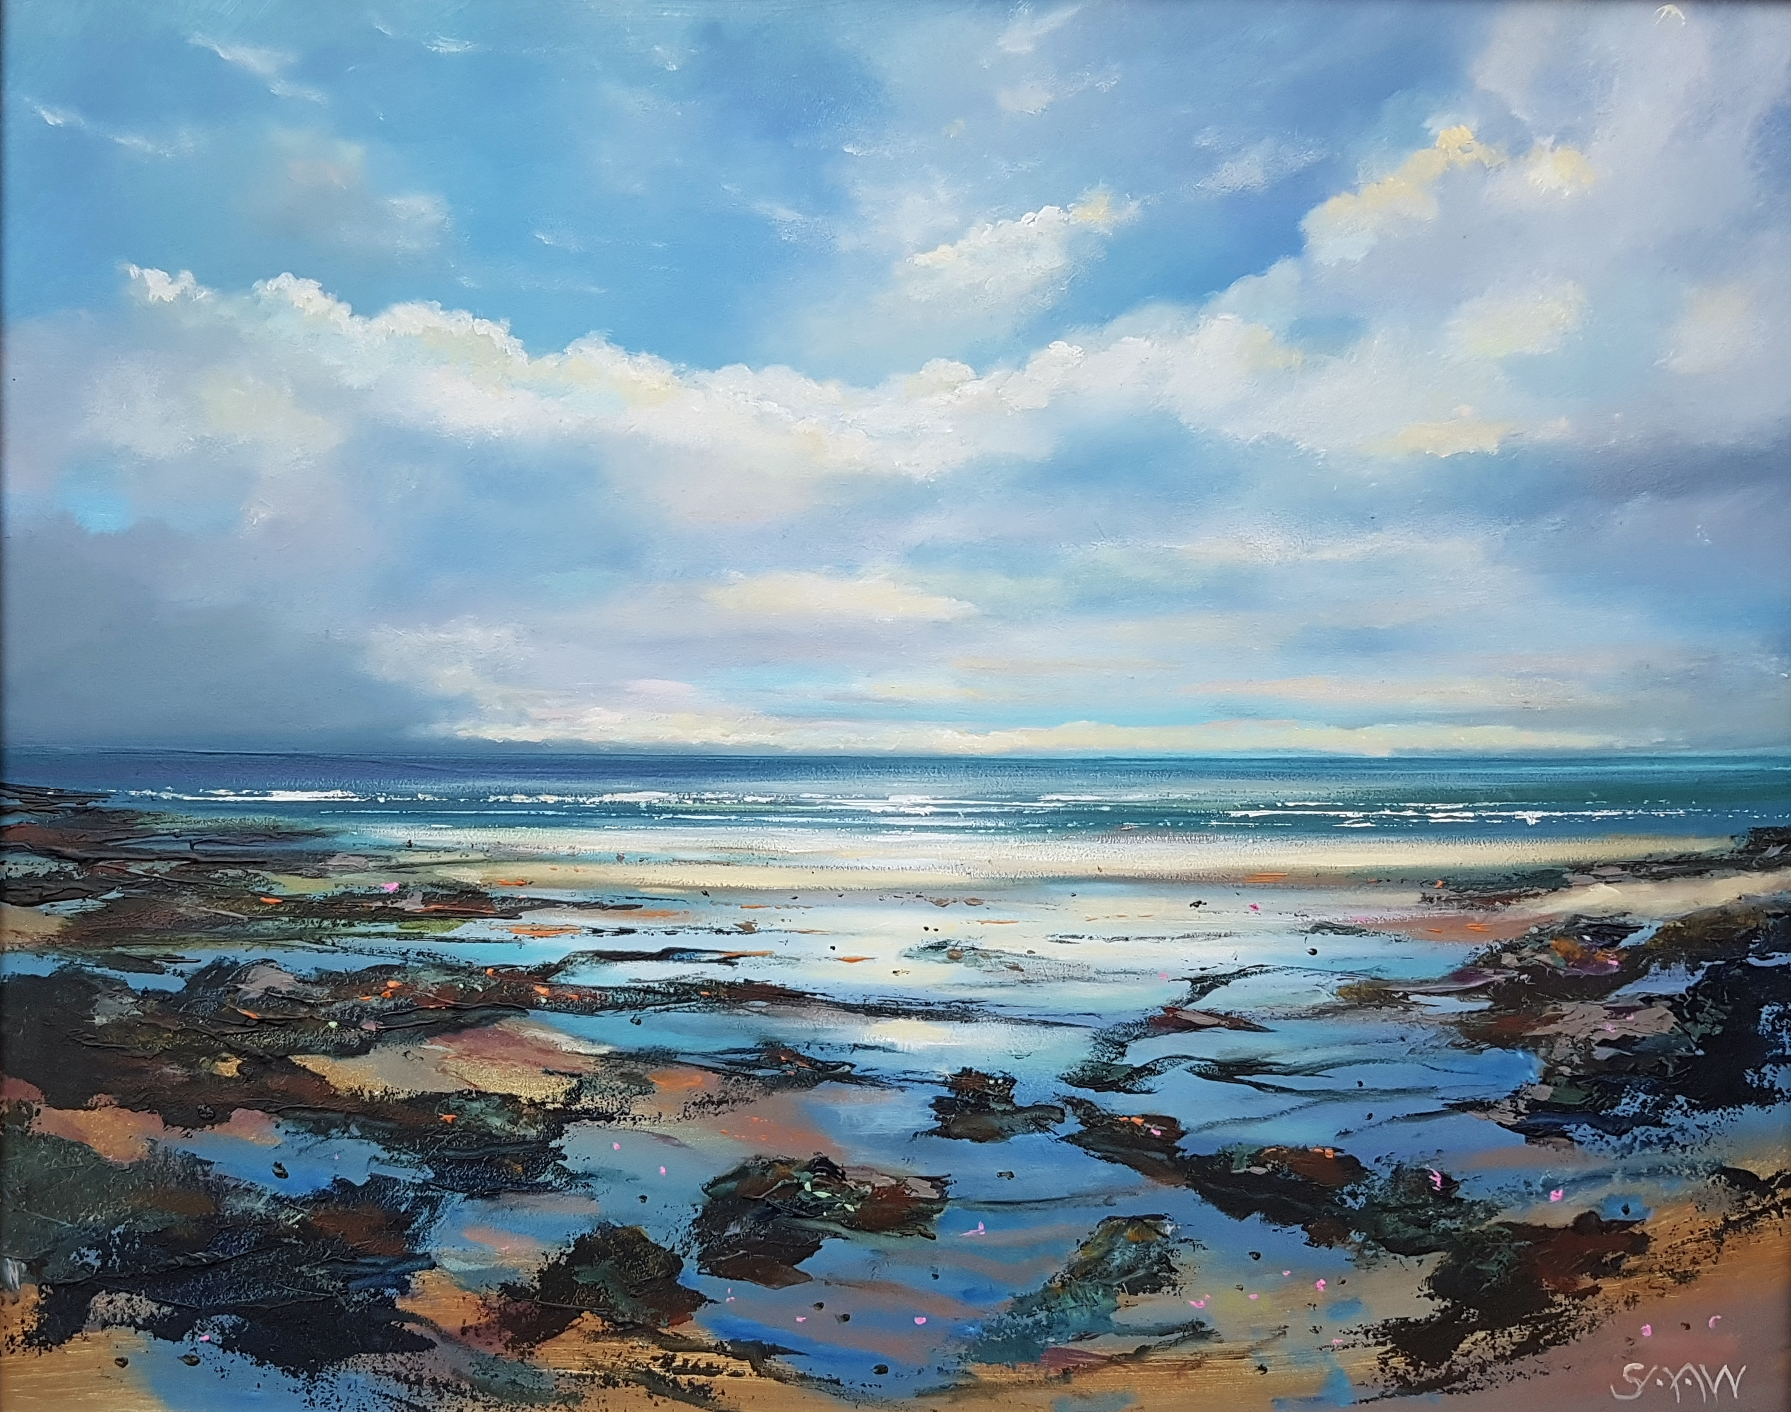 Fingal Shore - Robert Shaw